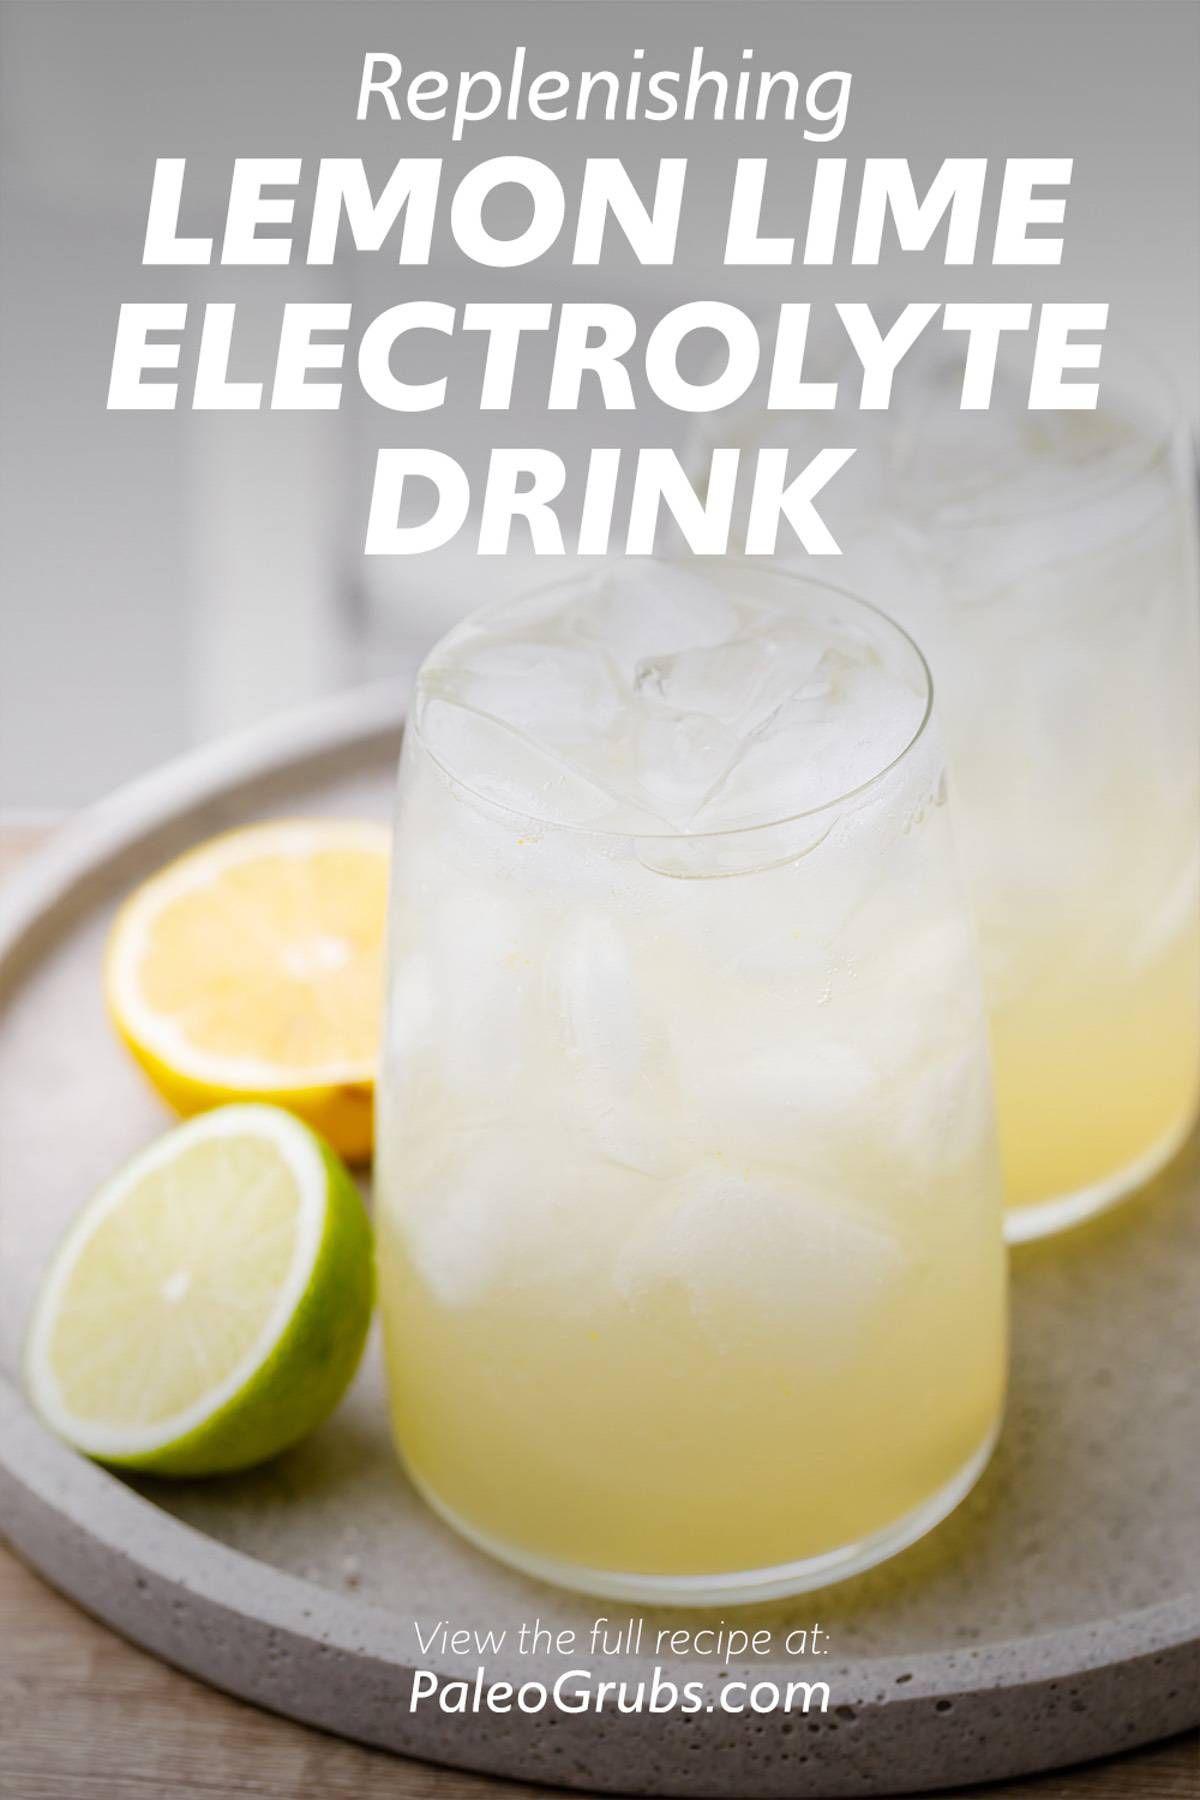 Homemade Lemon Lime Soda Electrolyte Drink In 2020 Electrolyte Drink Lime Drinks Homemade Electrolyte Drink